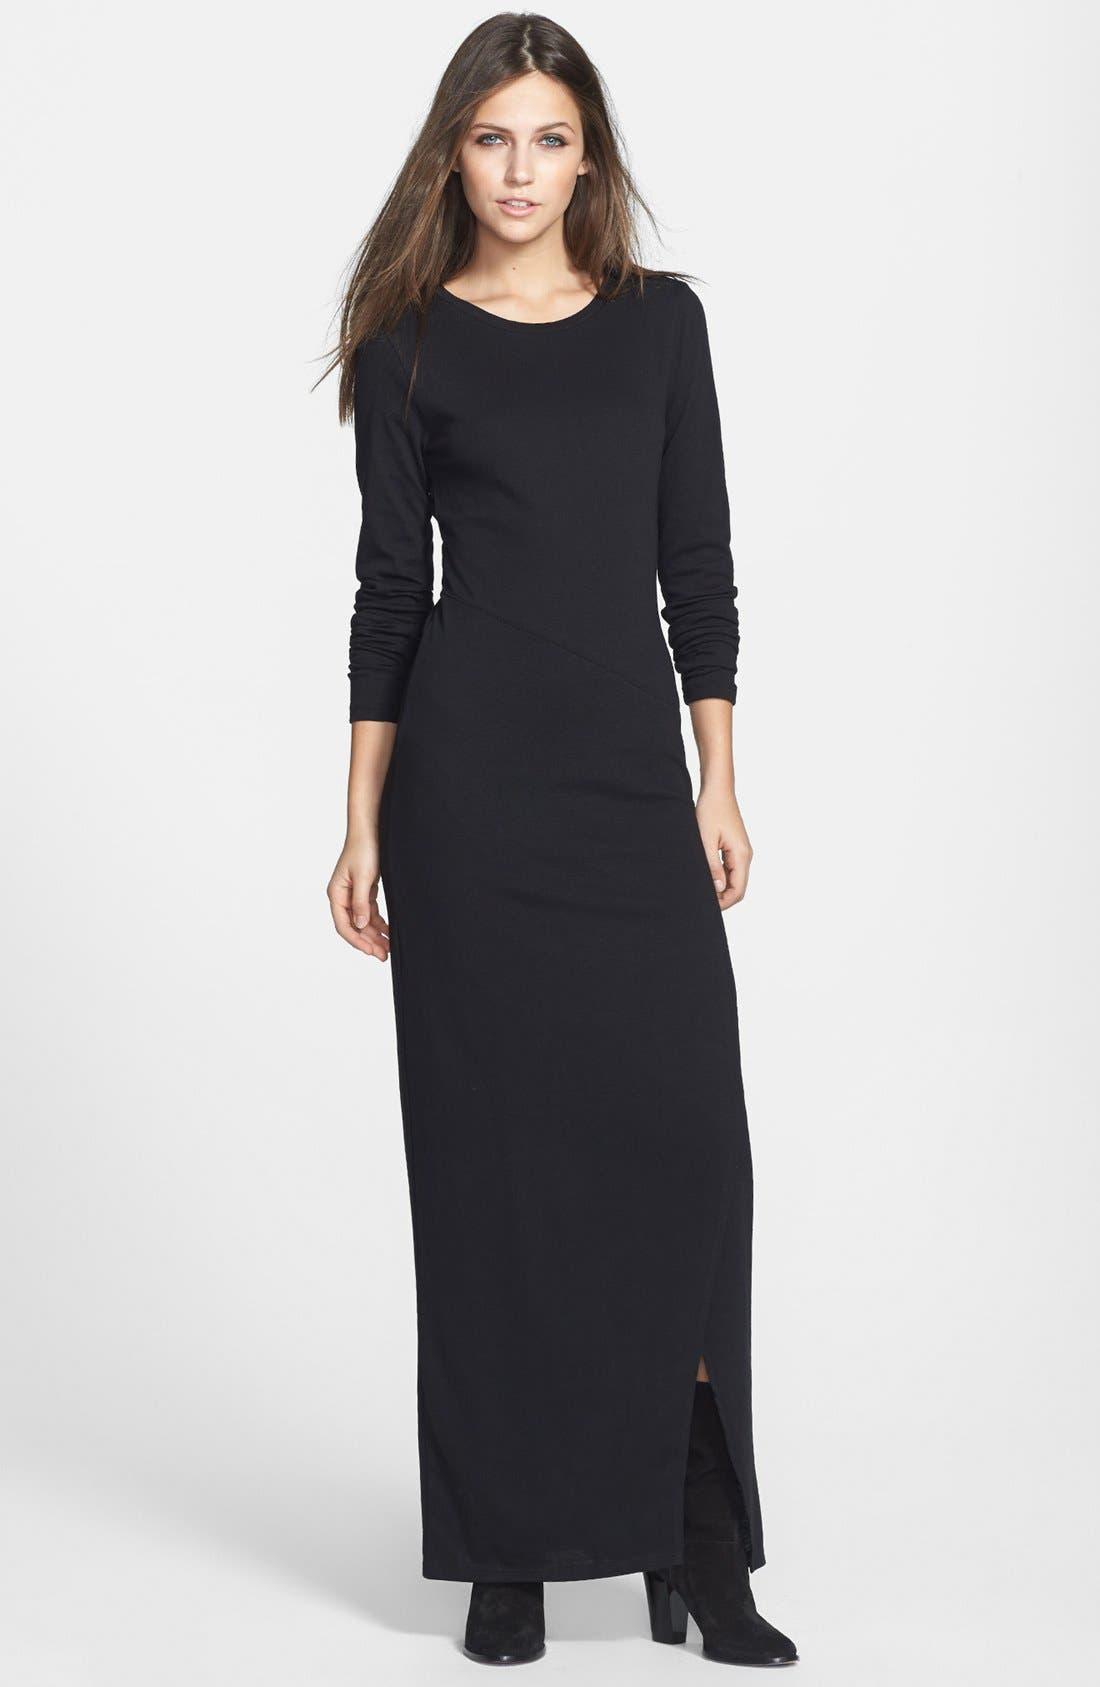 Main Image - Leith Long Sleeve Knit Maxi Dress